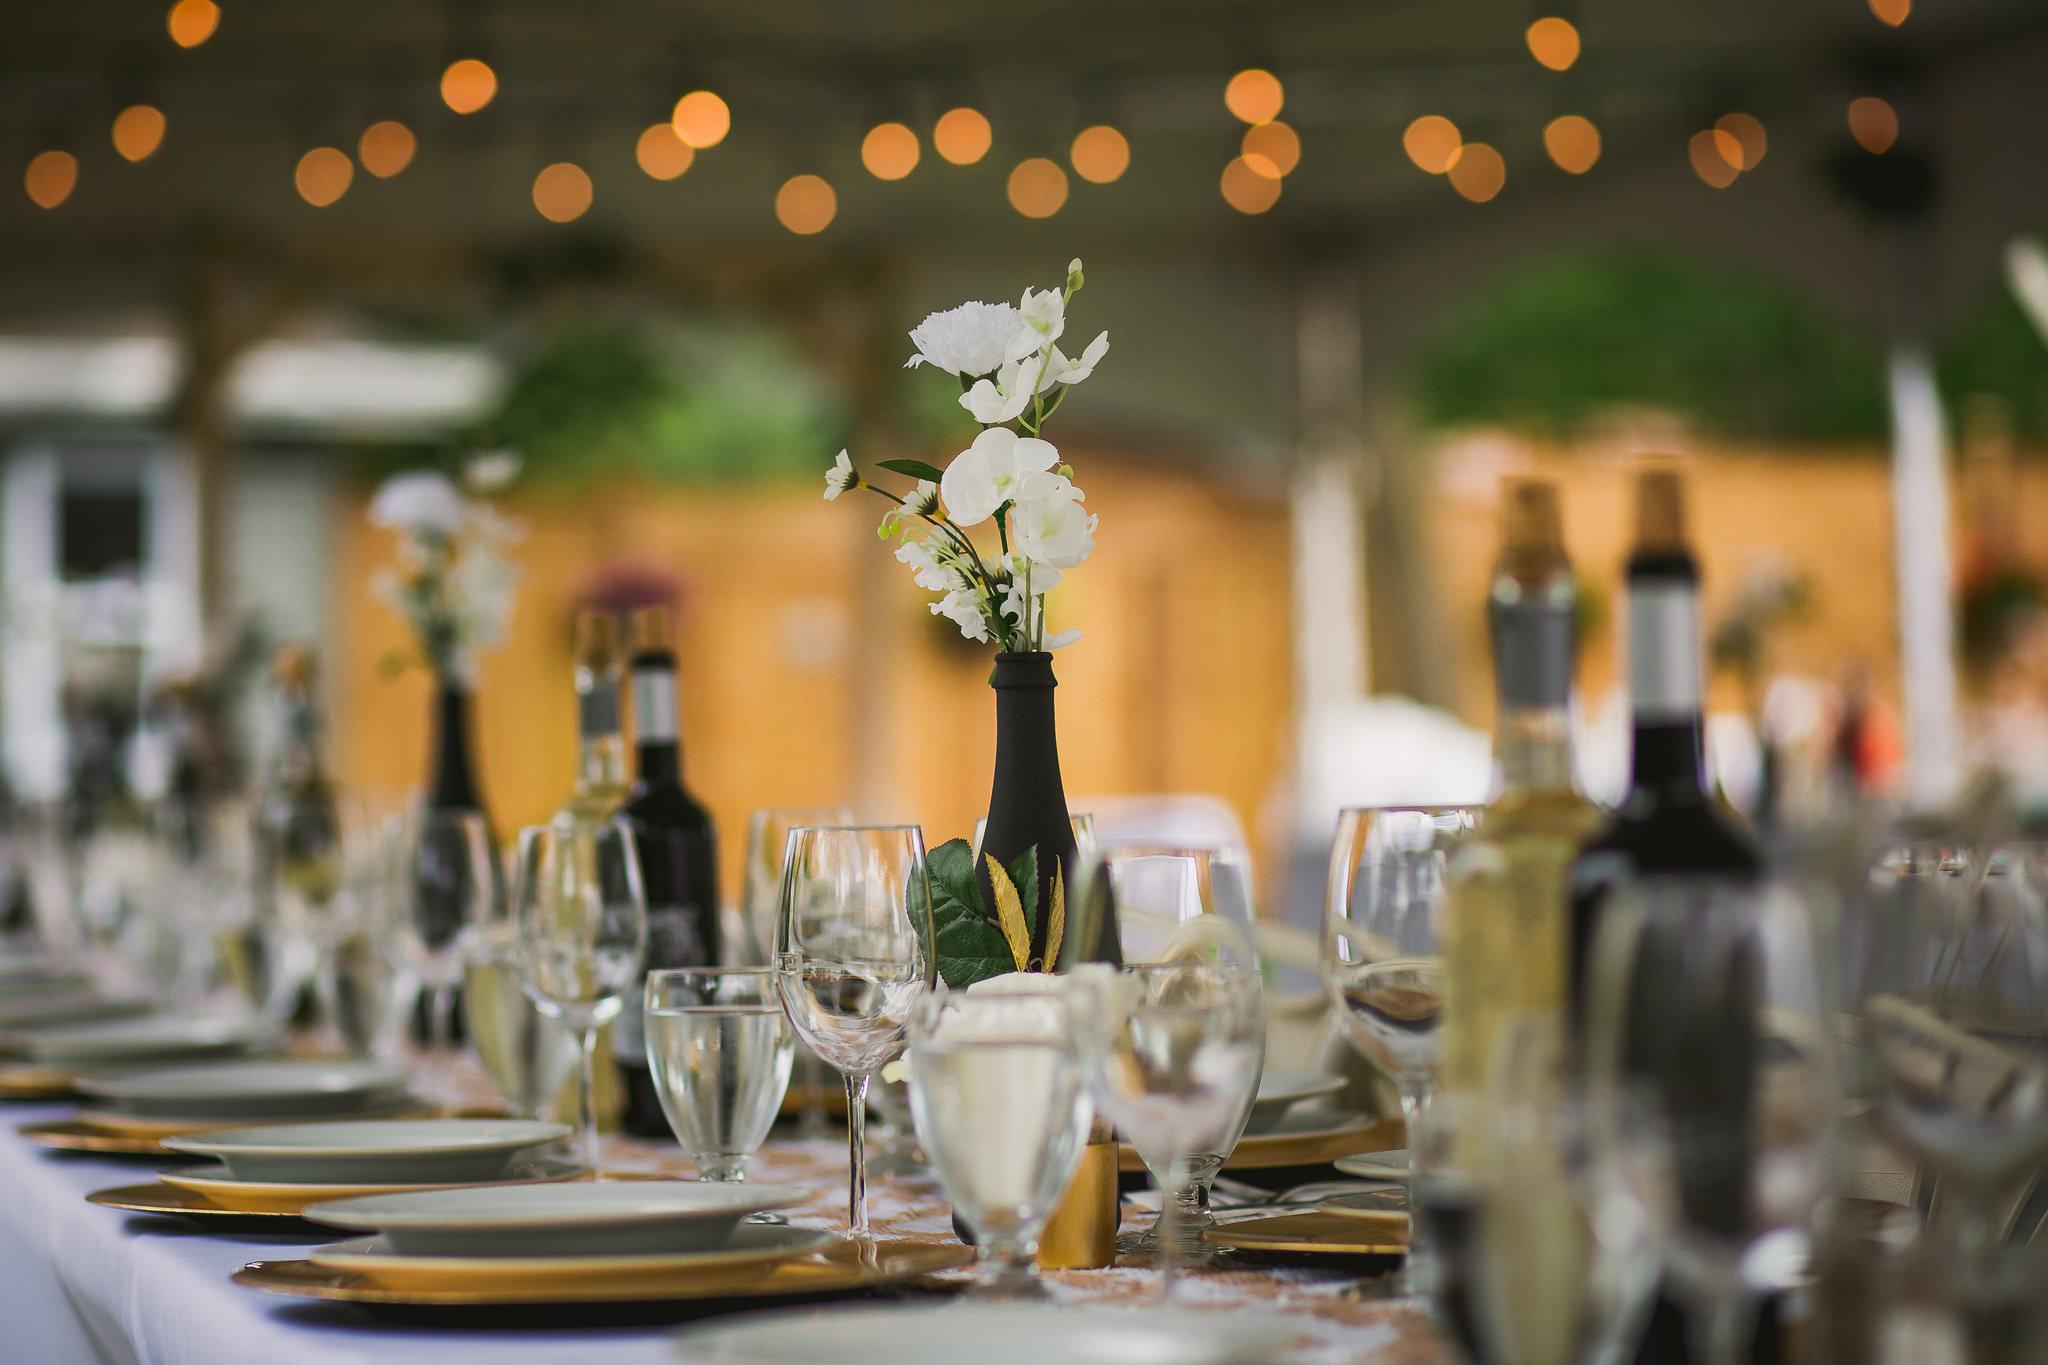 Kristen Adam Kindred Loft Whitby Wedding Photos 100 - Durham Wedding Photographer: Kindred Loft Wedding Photos